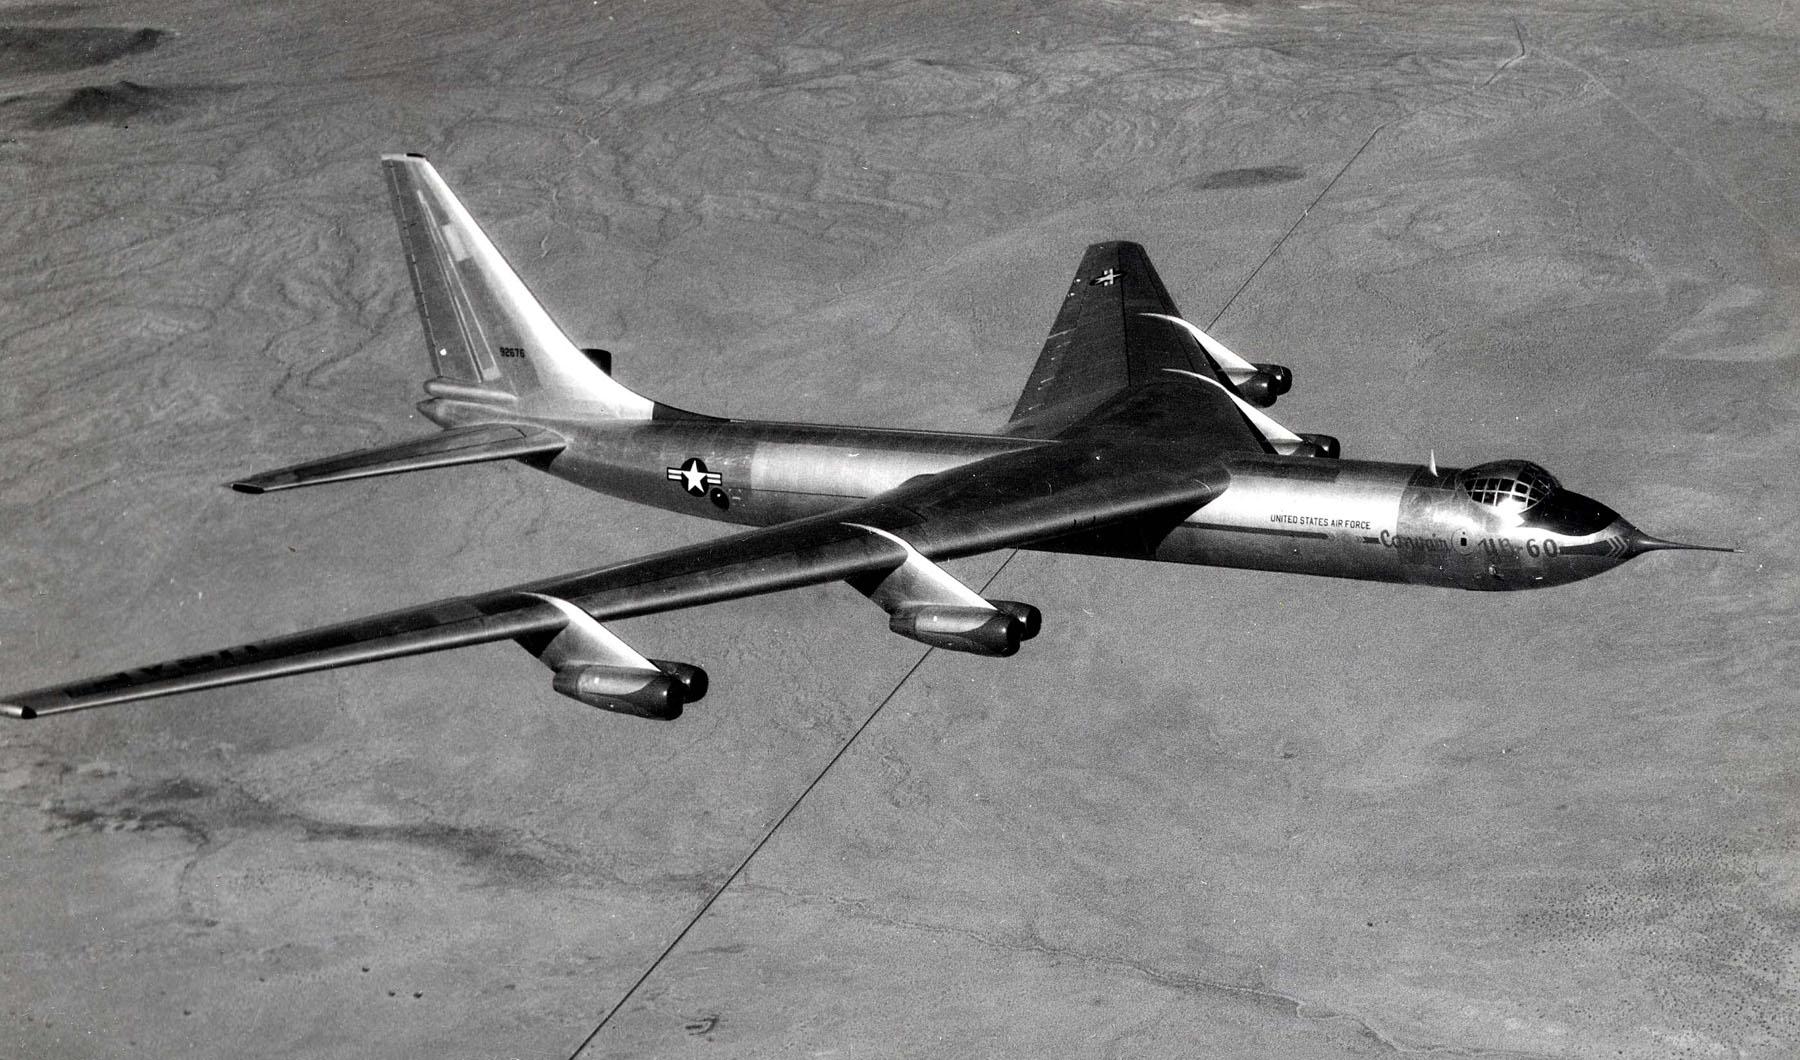 Convair YB 60